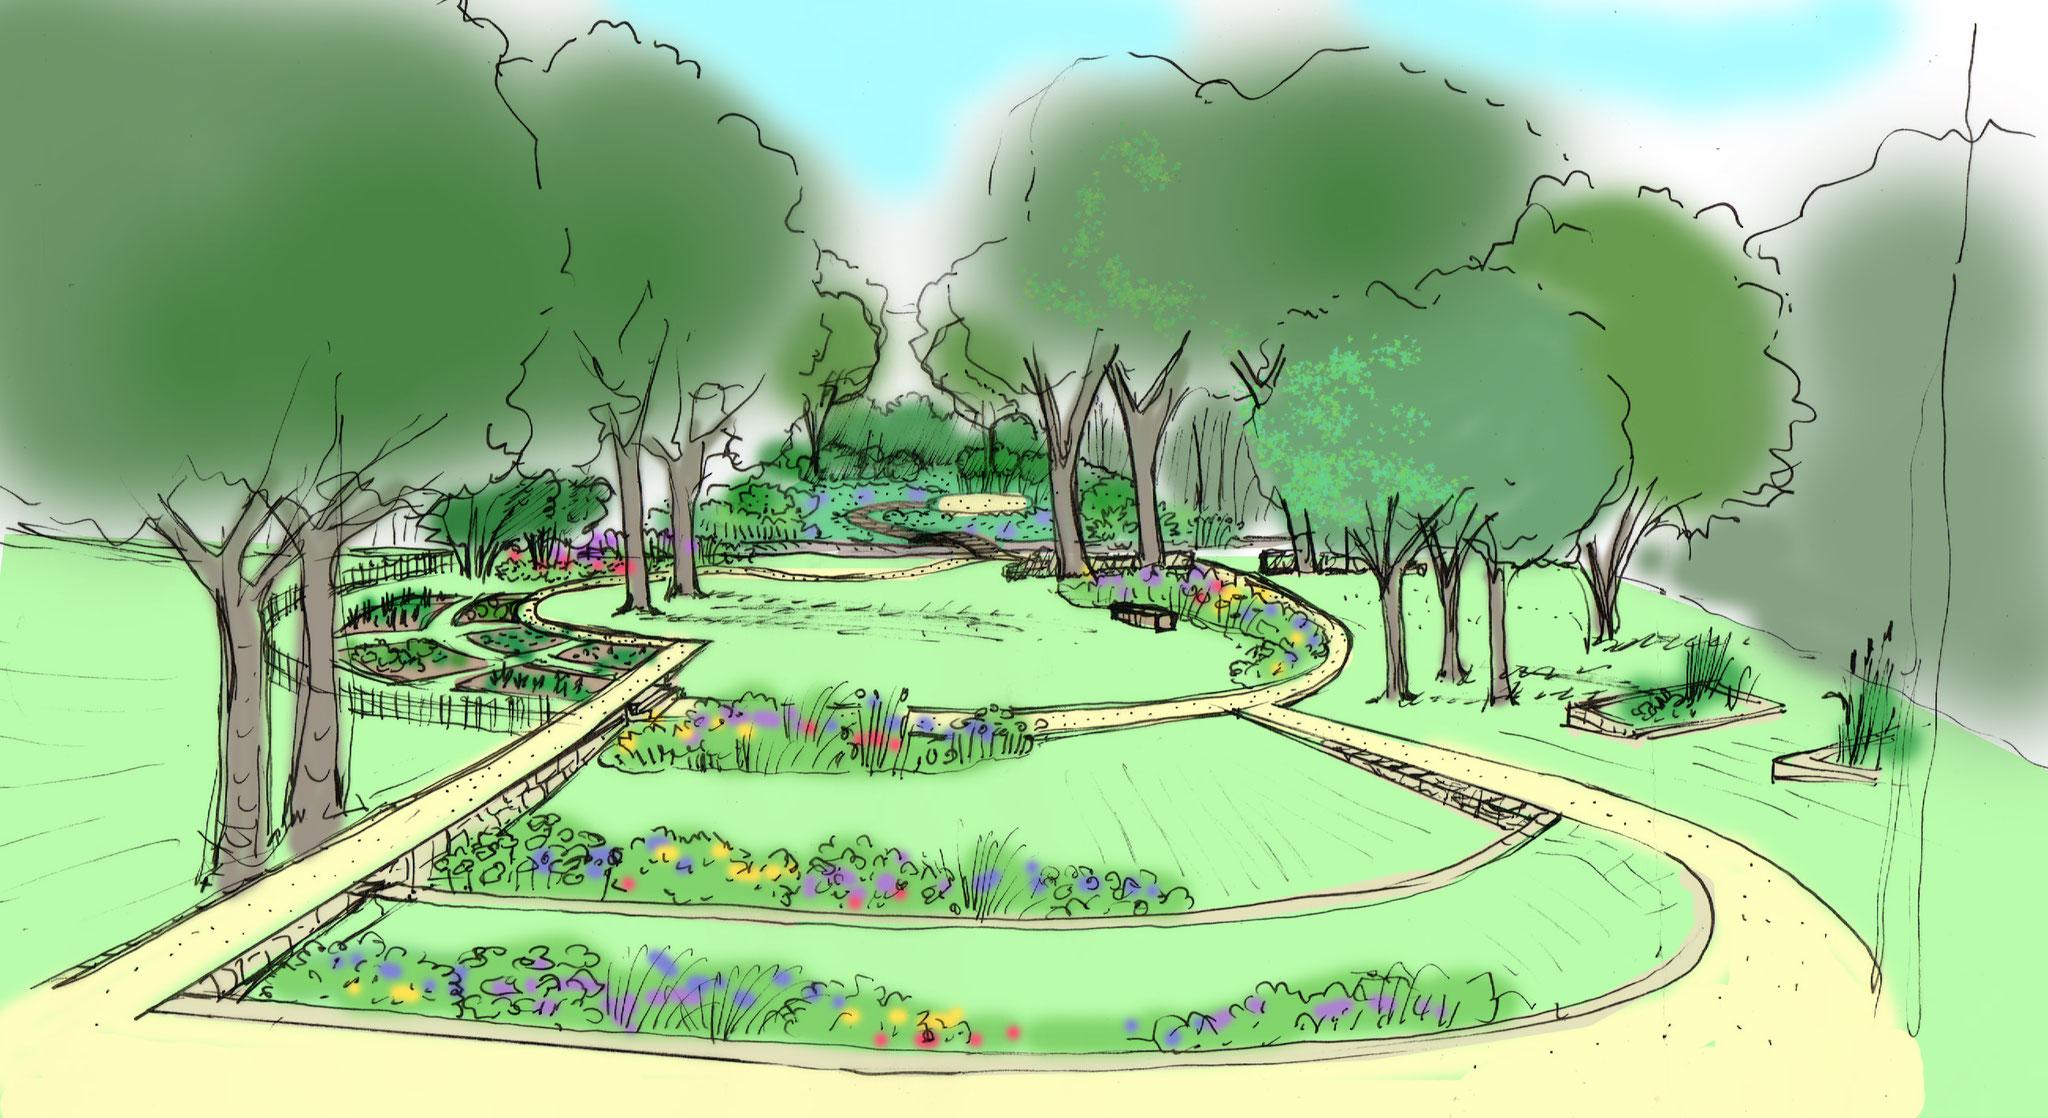 Jardin en bord de rivière